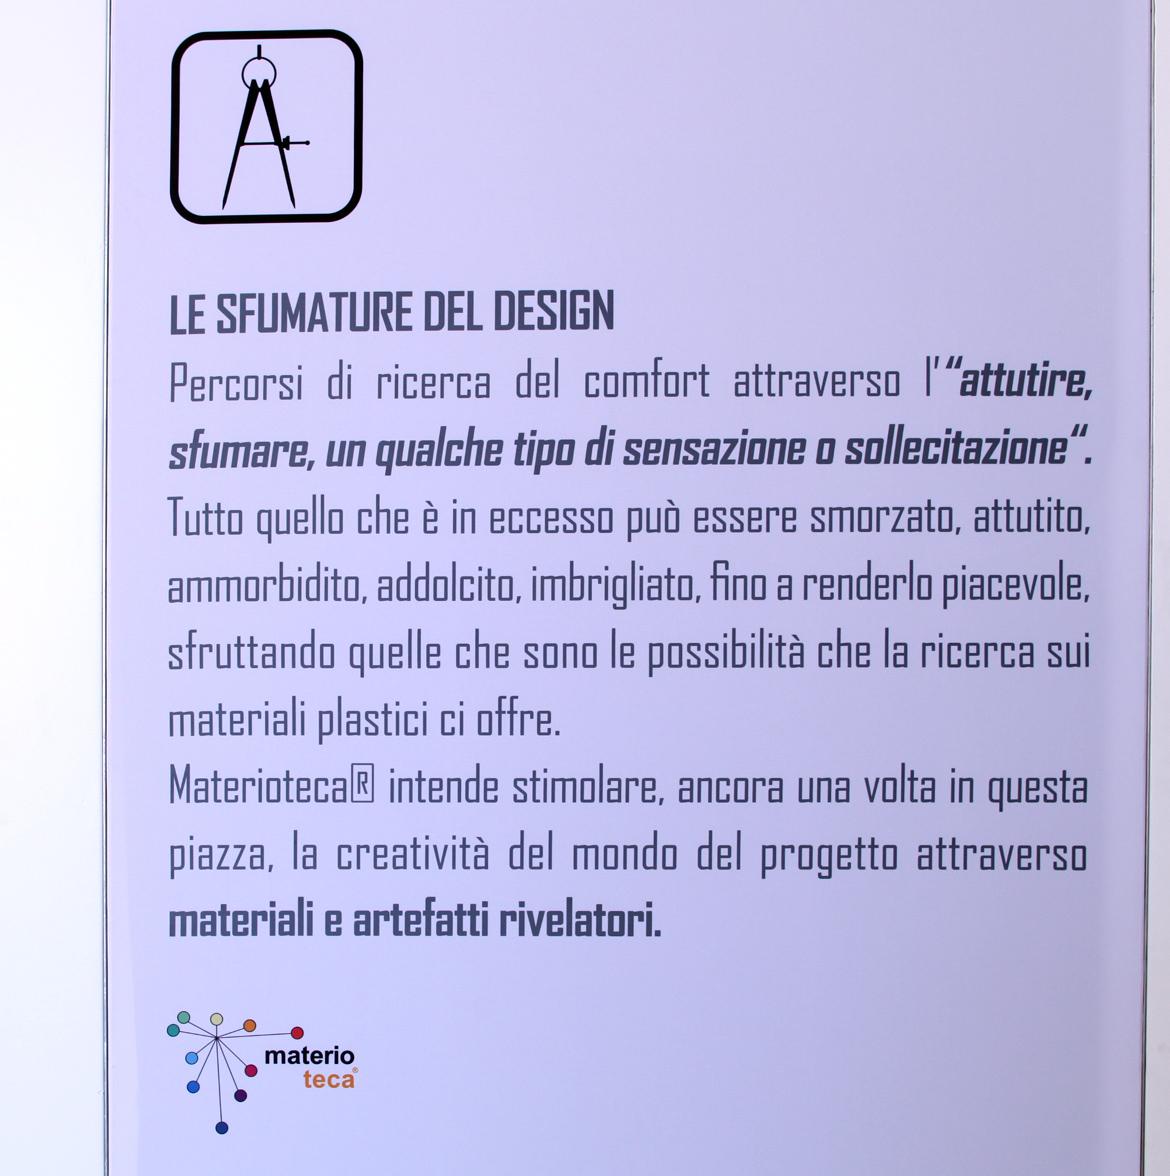 MEecSpe 2013 - Le sfumature del design